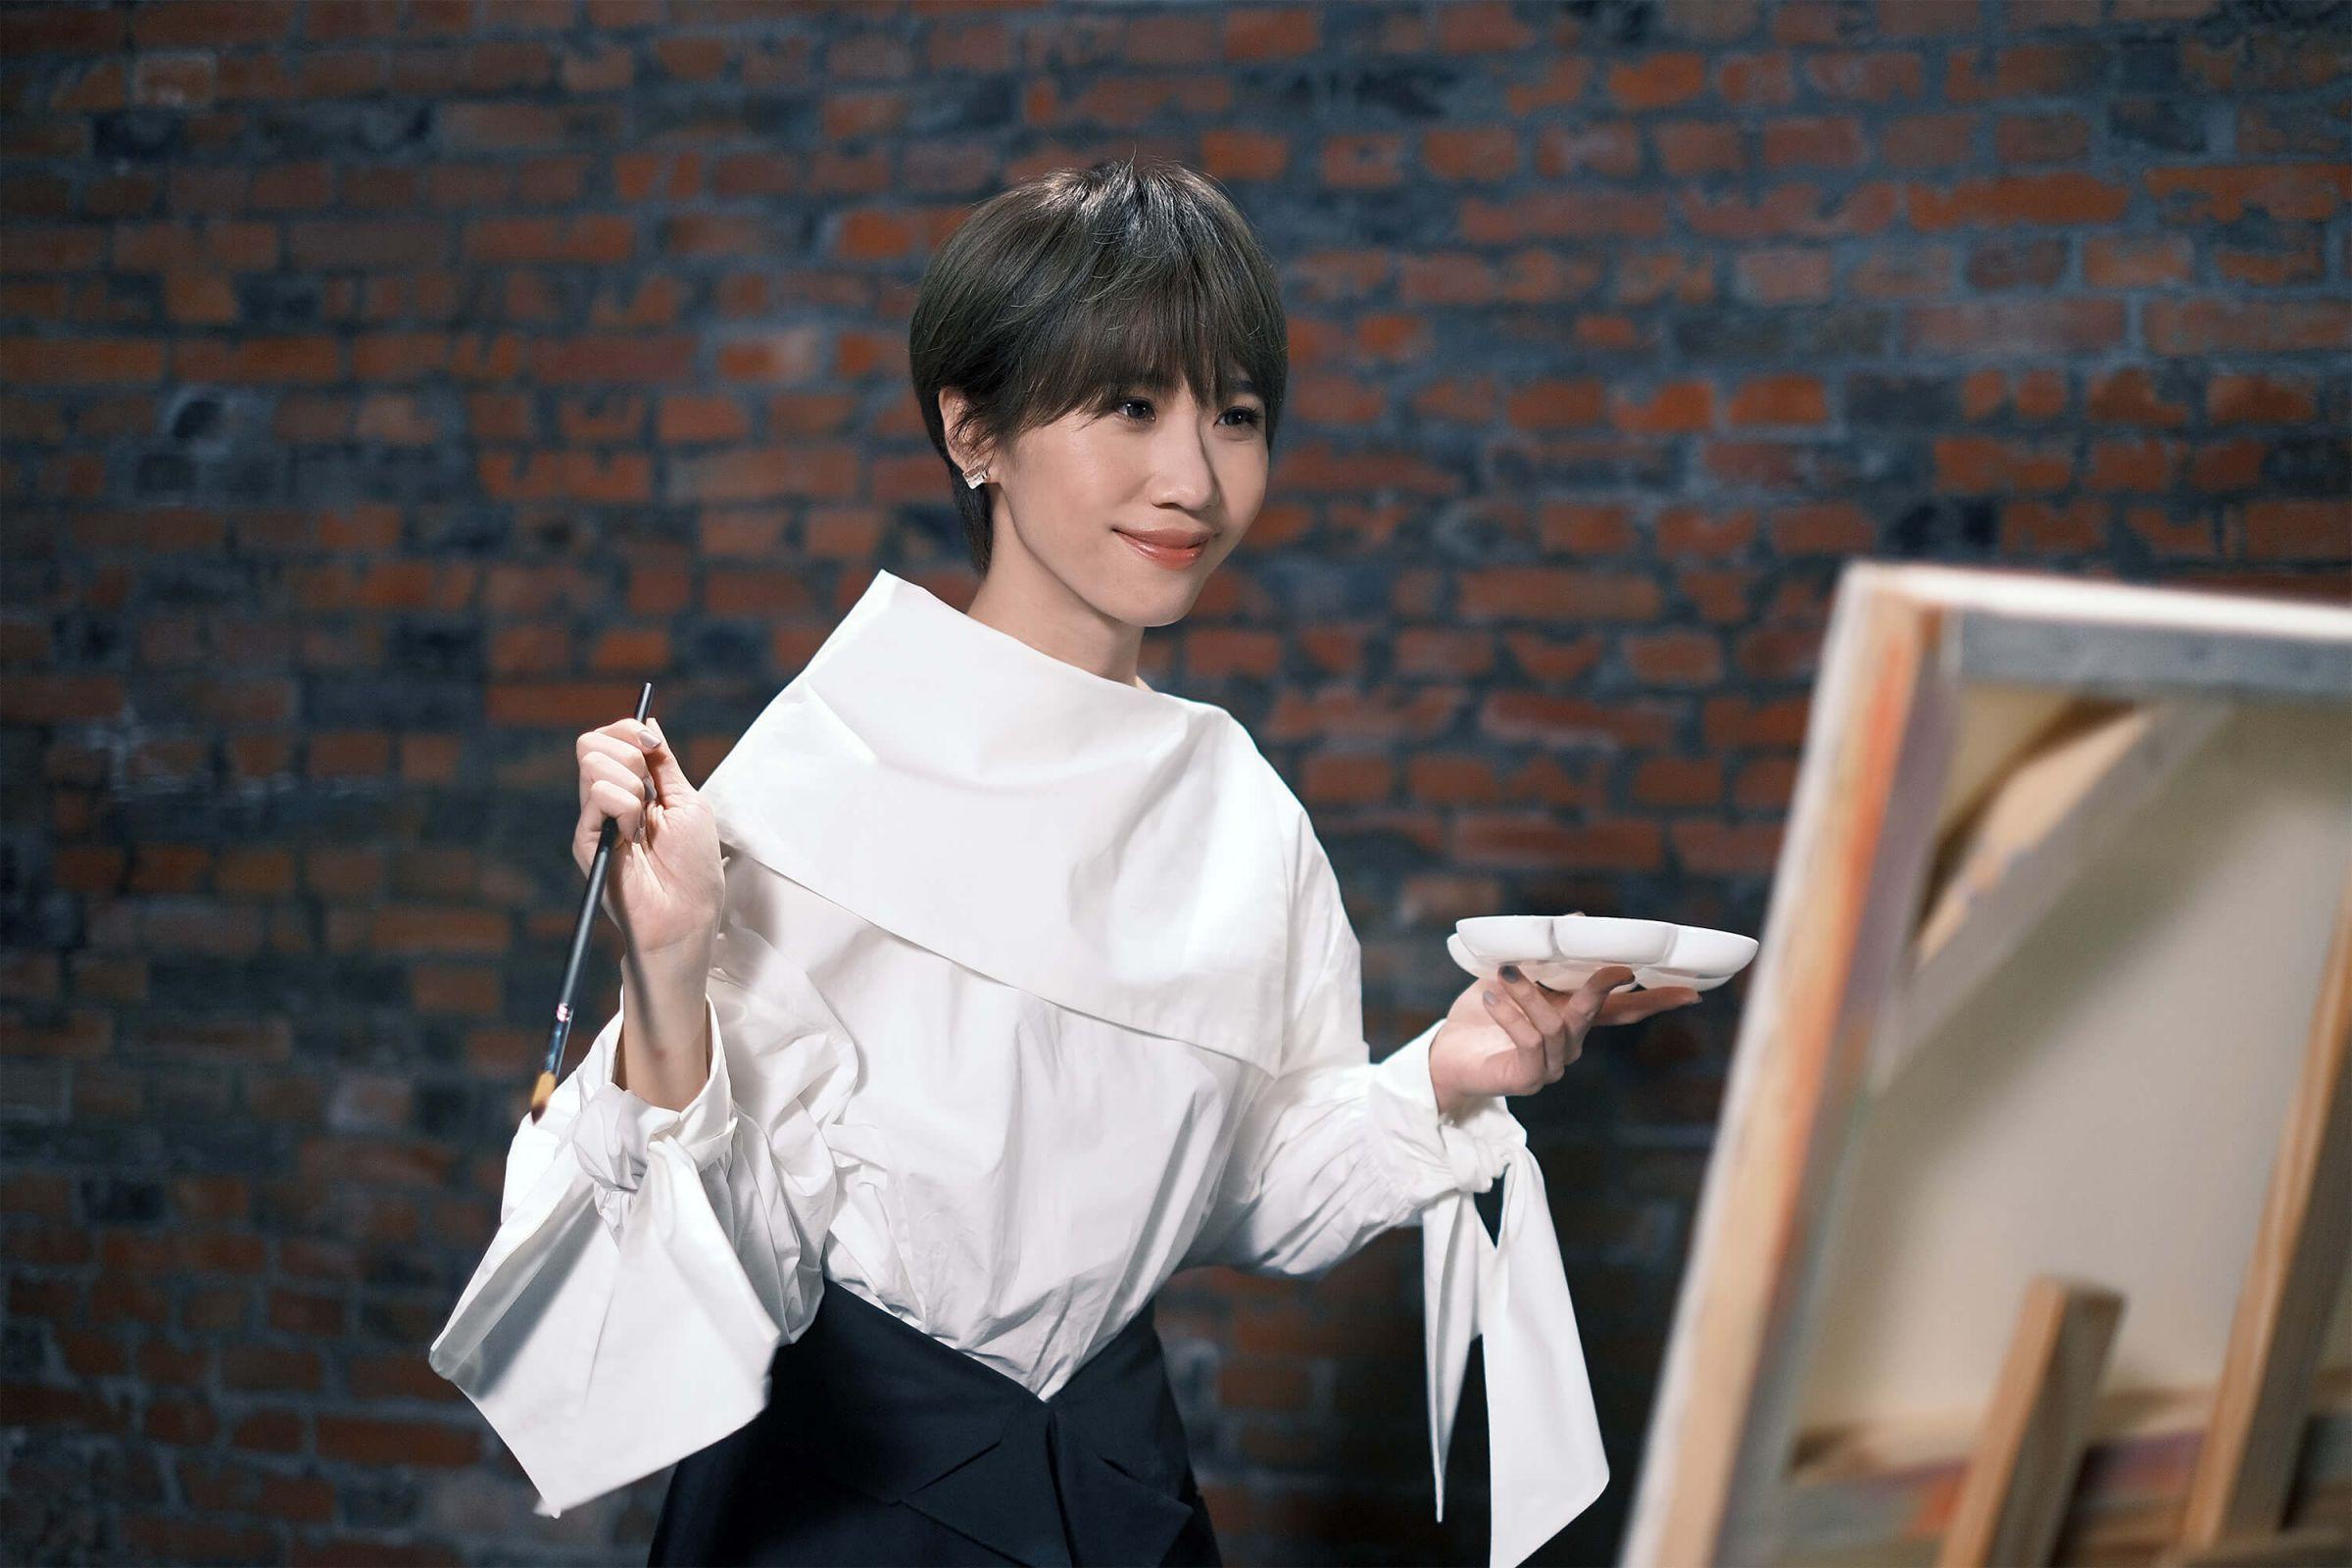 Lulu黃路梓茵「歲末年終獻禮」 挑戰一人分飾兩角!